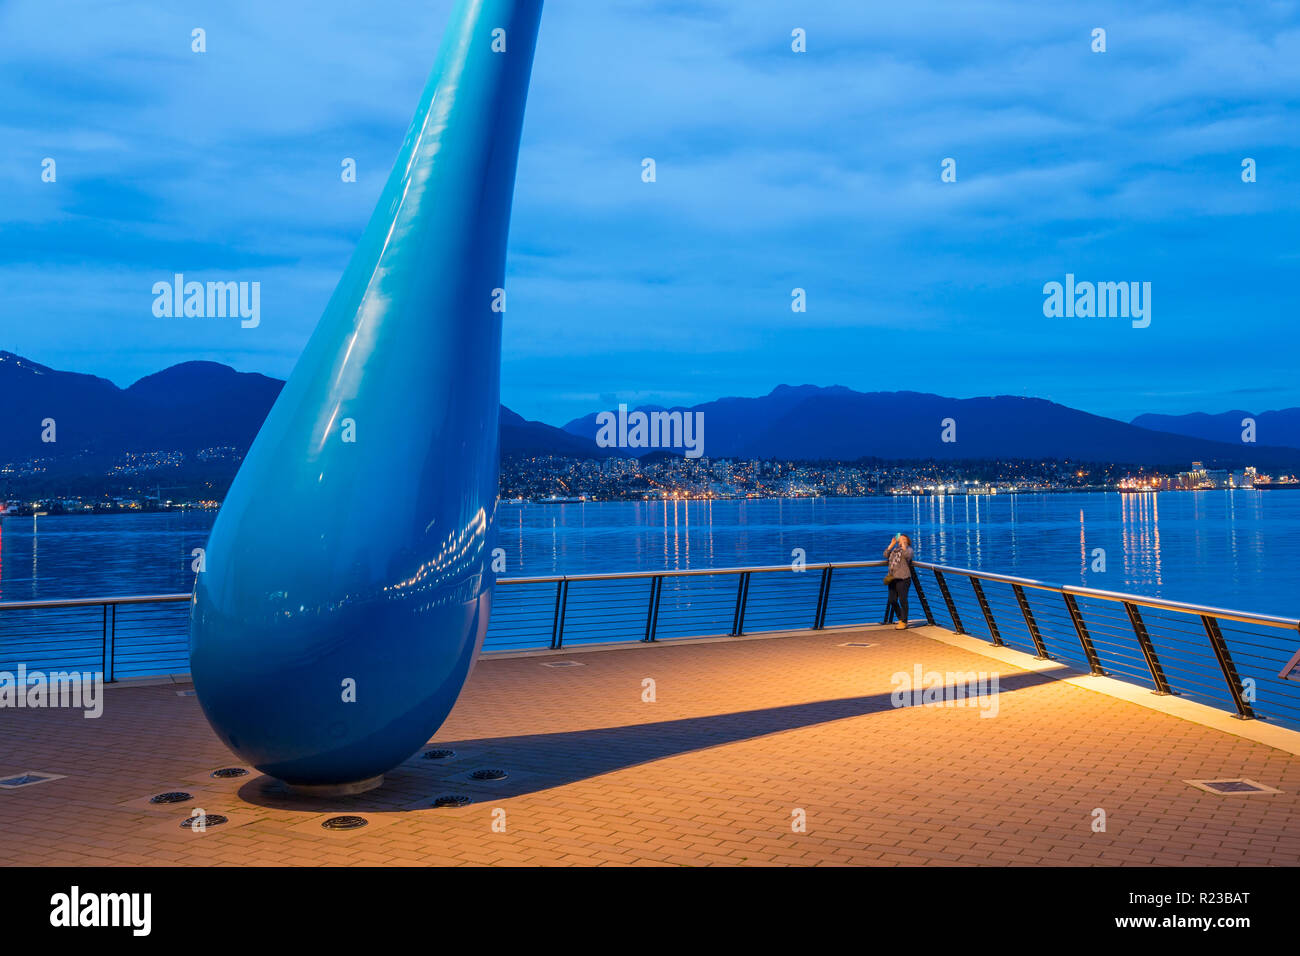 "Vancouver, Kanada - September 2015: Skulptur mit dem Titel ""Die Drop"" Vancouver Convention Center West, Vancouver, British Columbia, Kanada Stockbild"